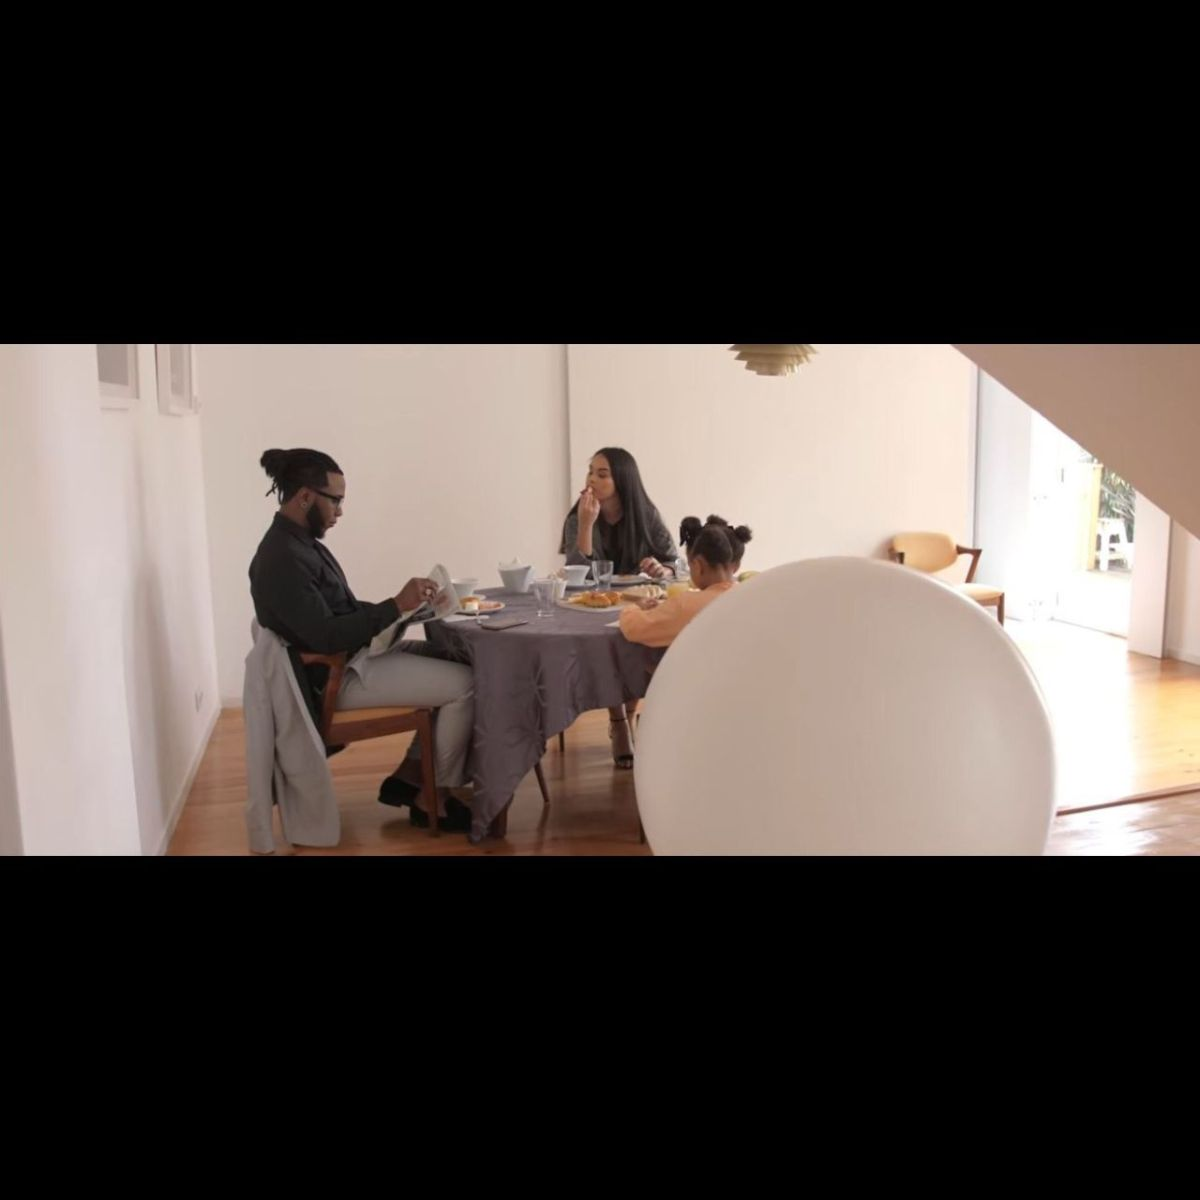 Dynamo - Traição (Thumbnail)